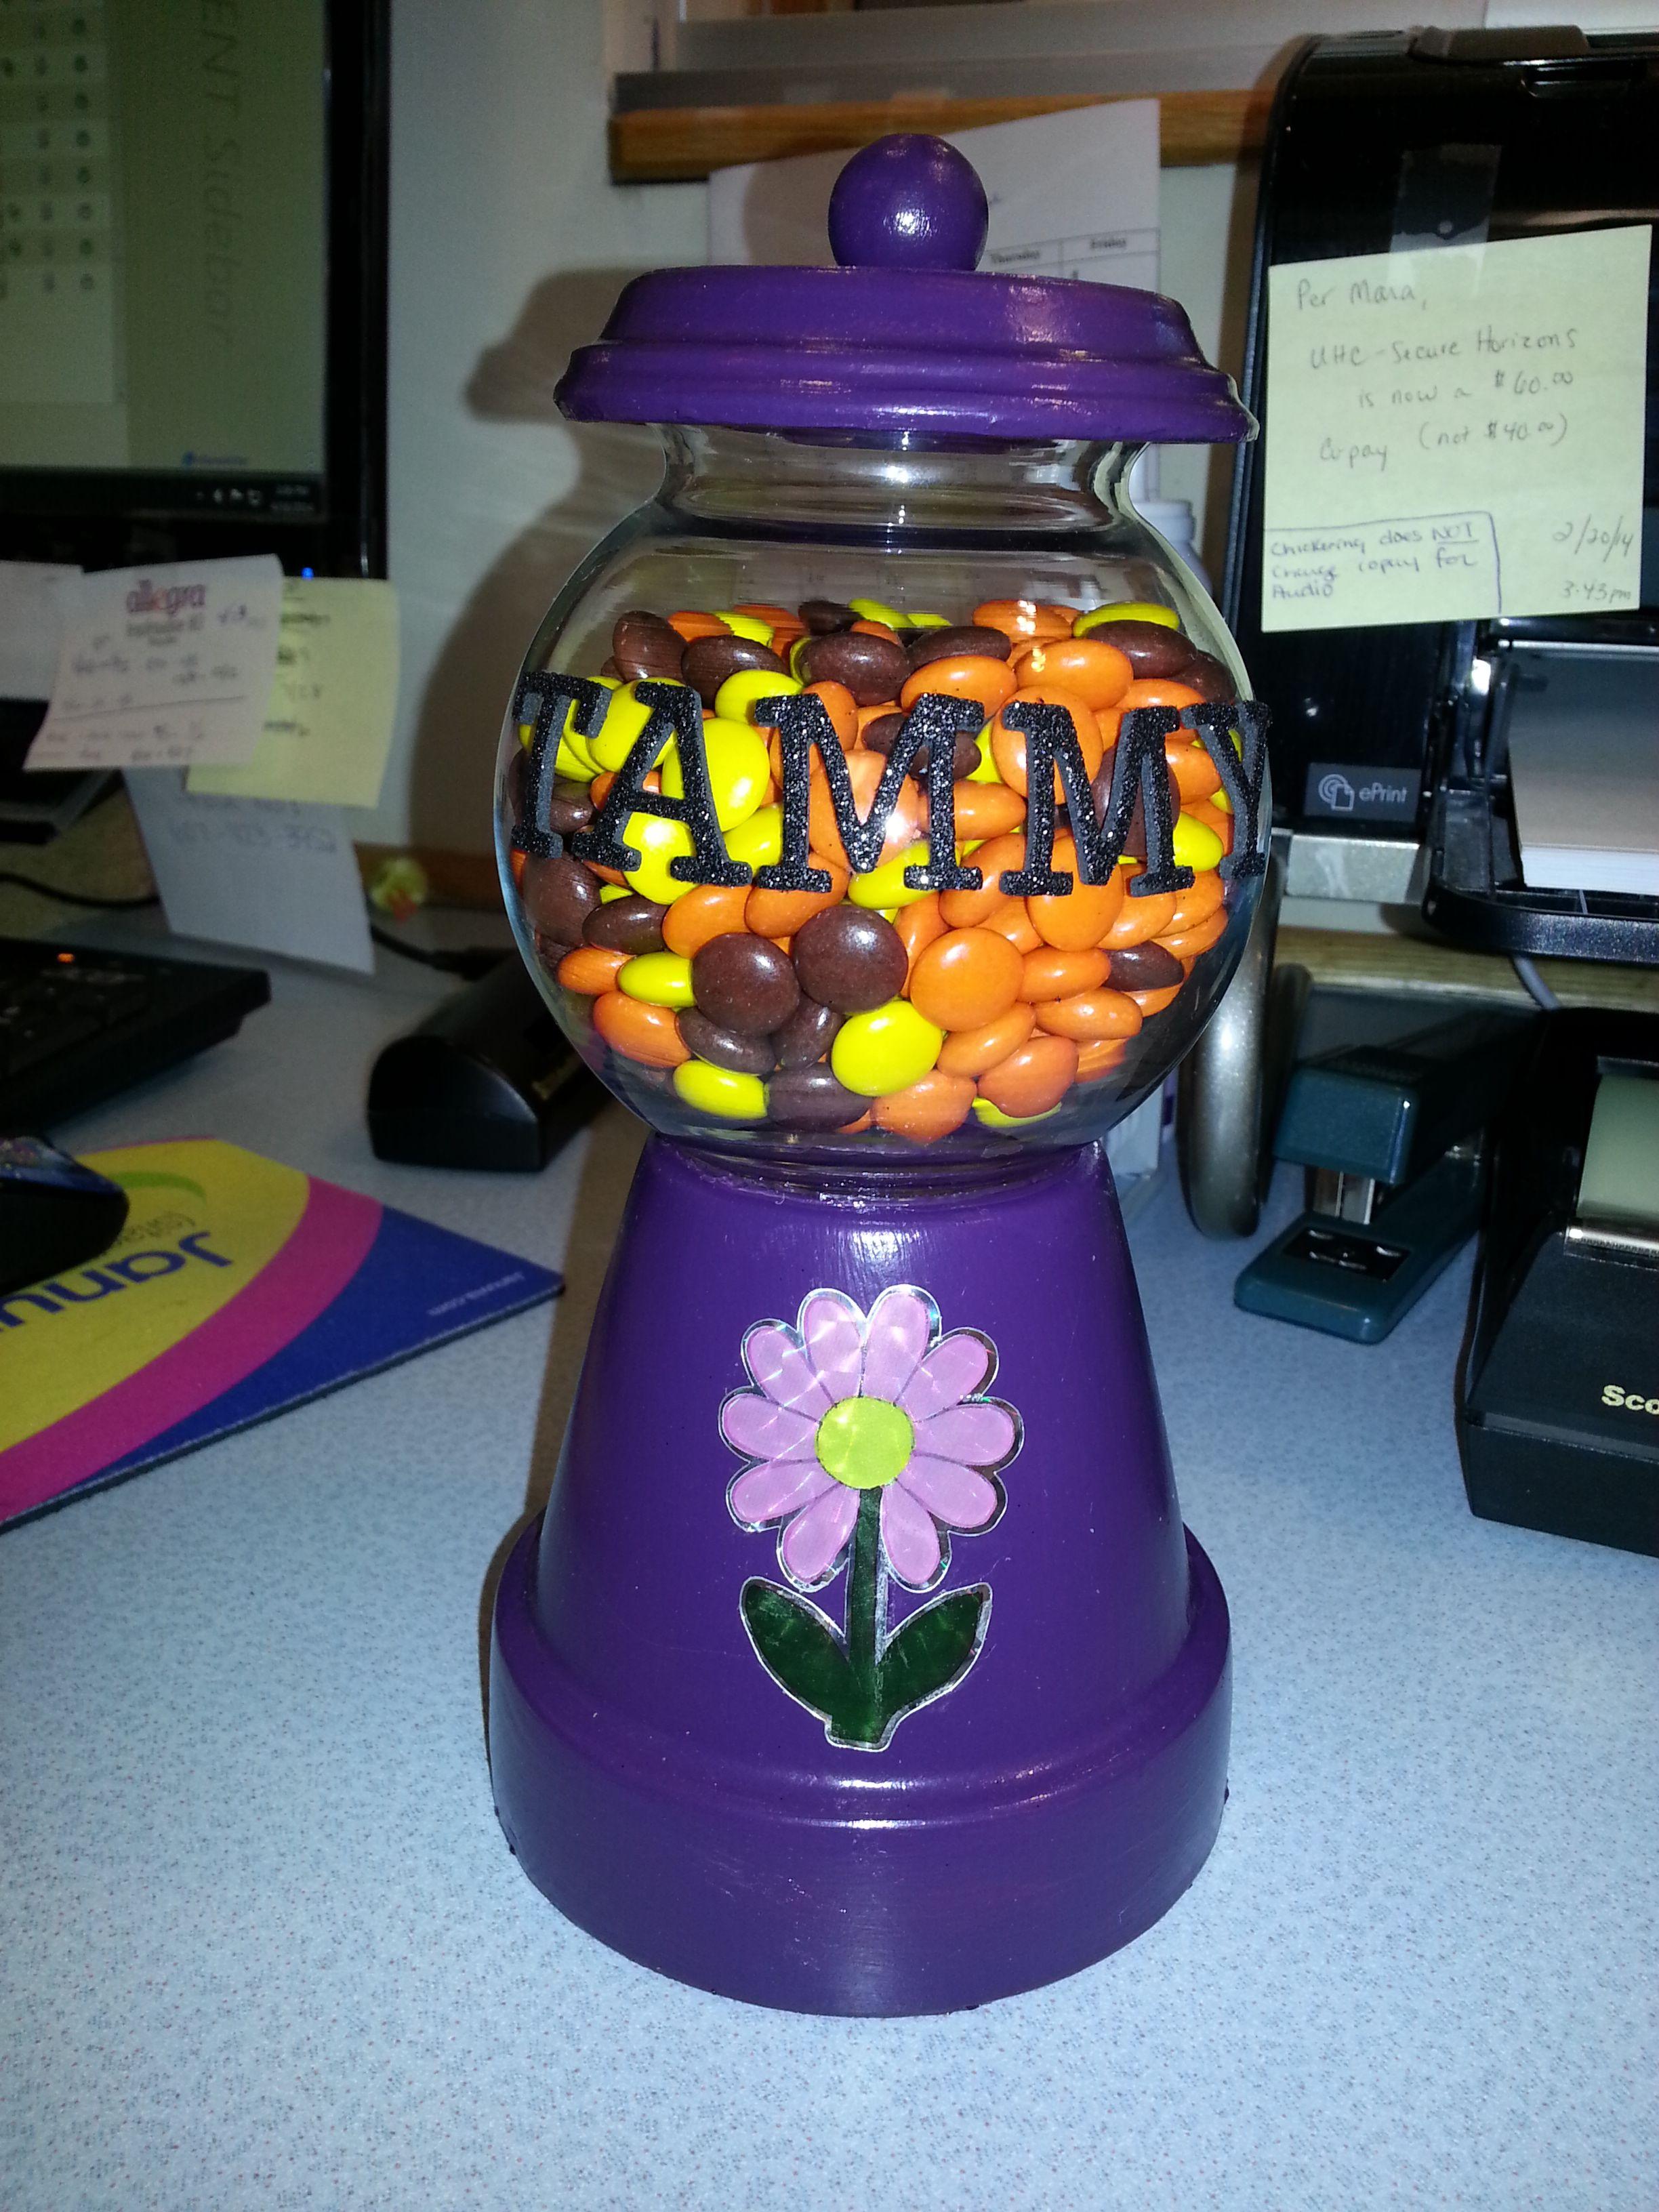 fb42be83 Savings Jar Craft Ideas Gumball Machine - Year of Clean Water